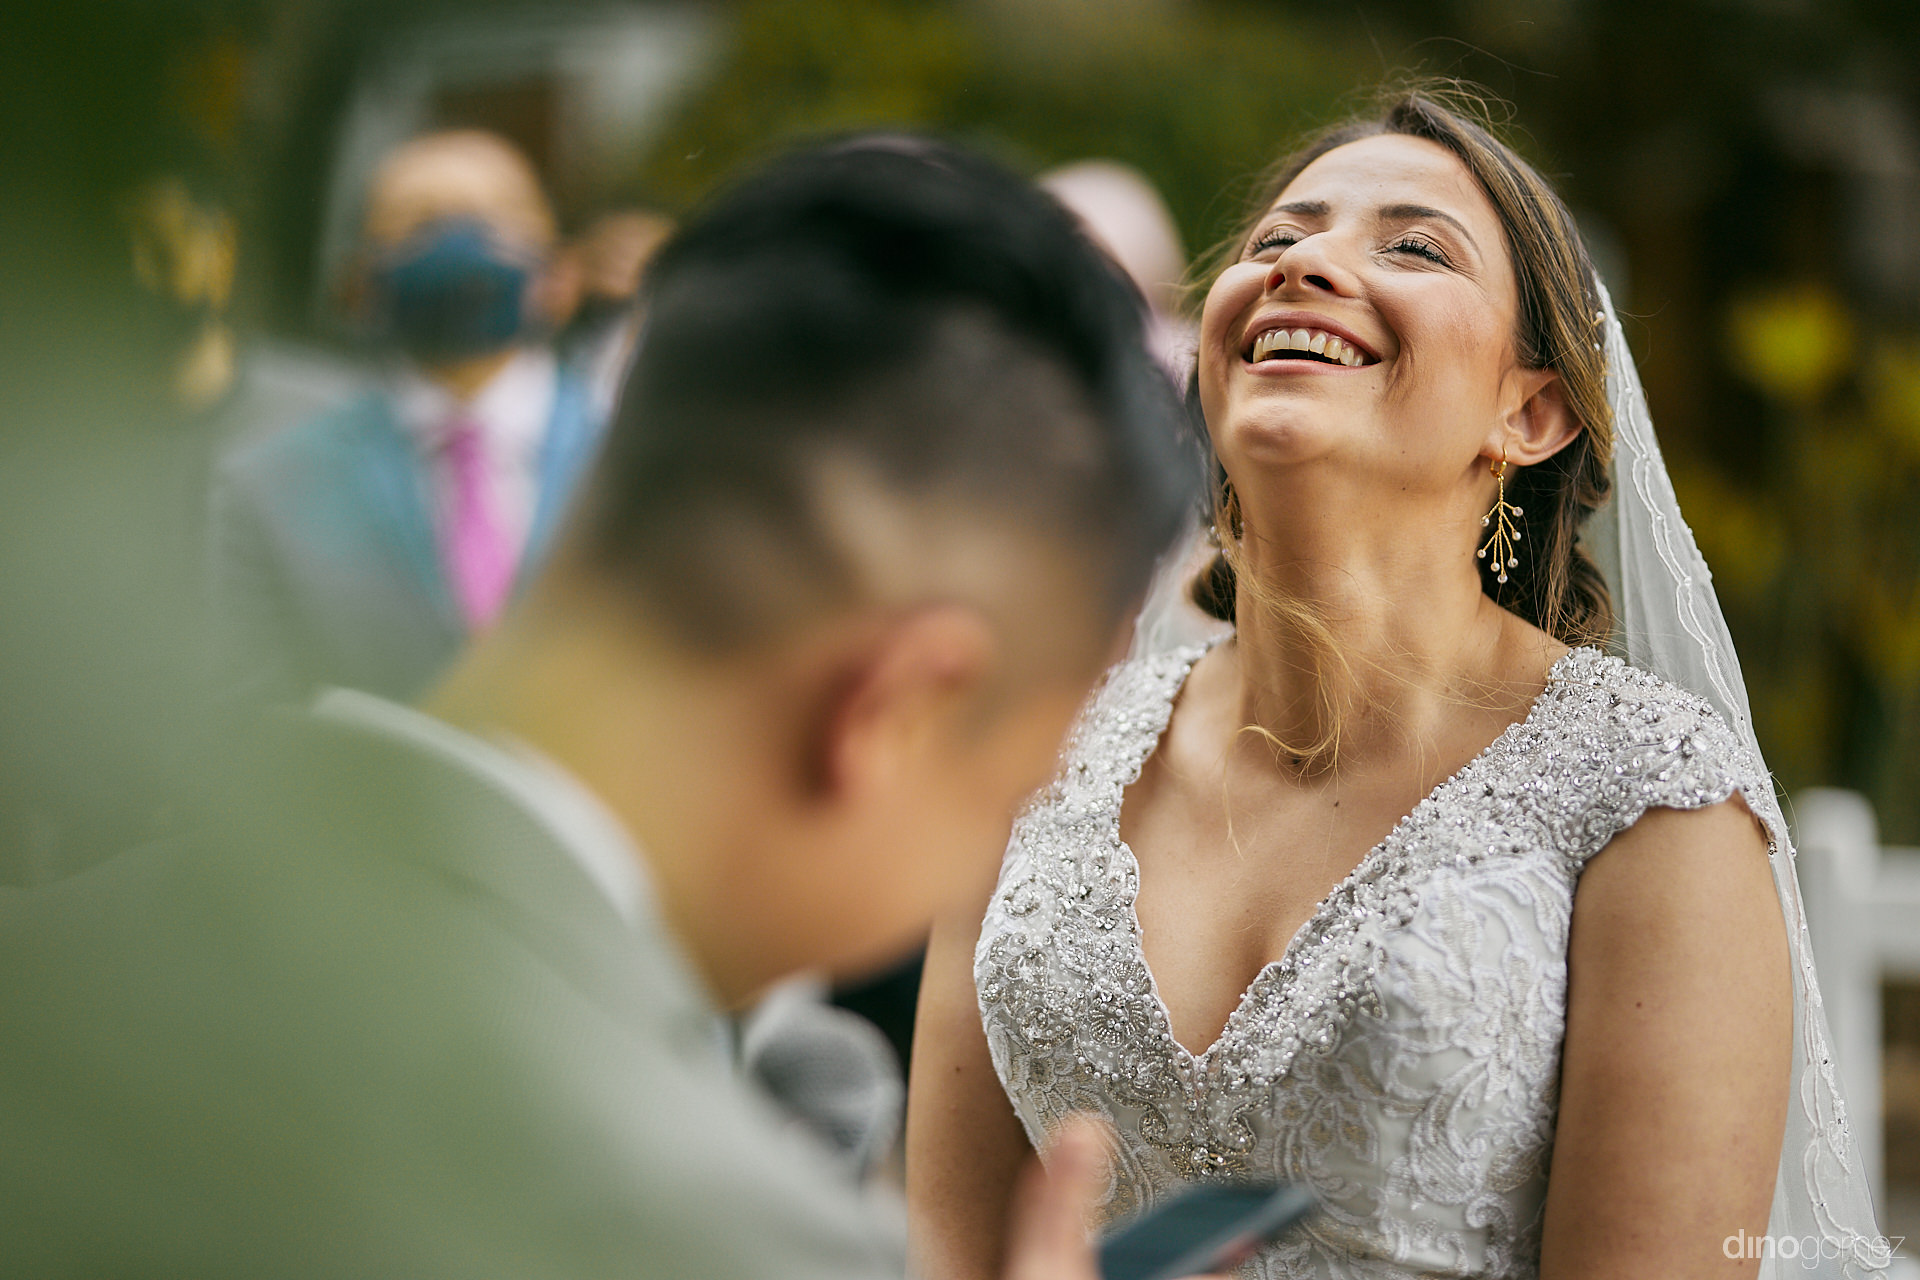 003 - Diy Budget Destination Weddings Can Be Prety Too!